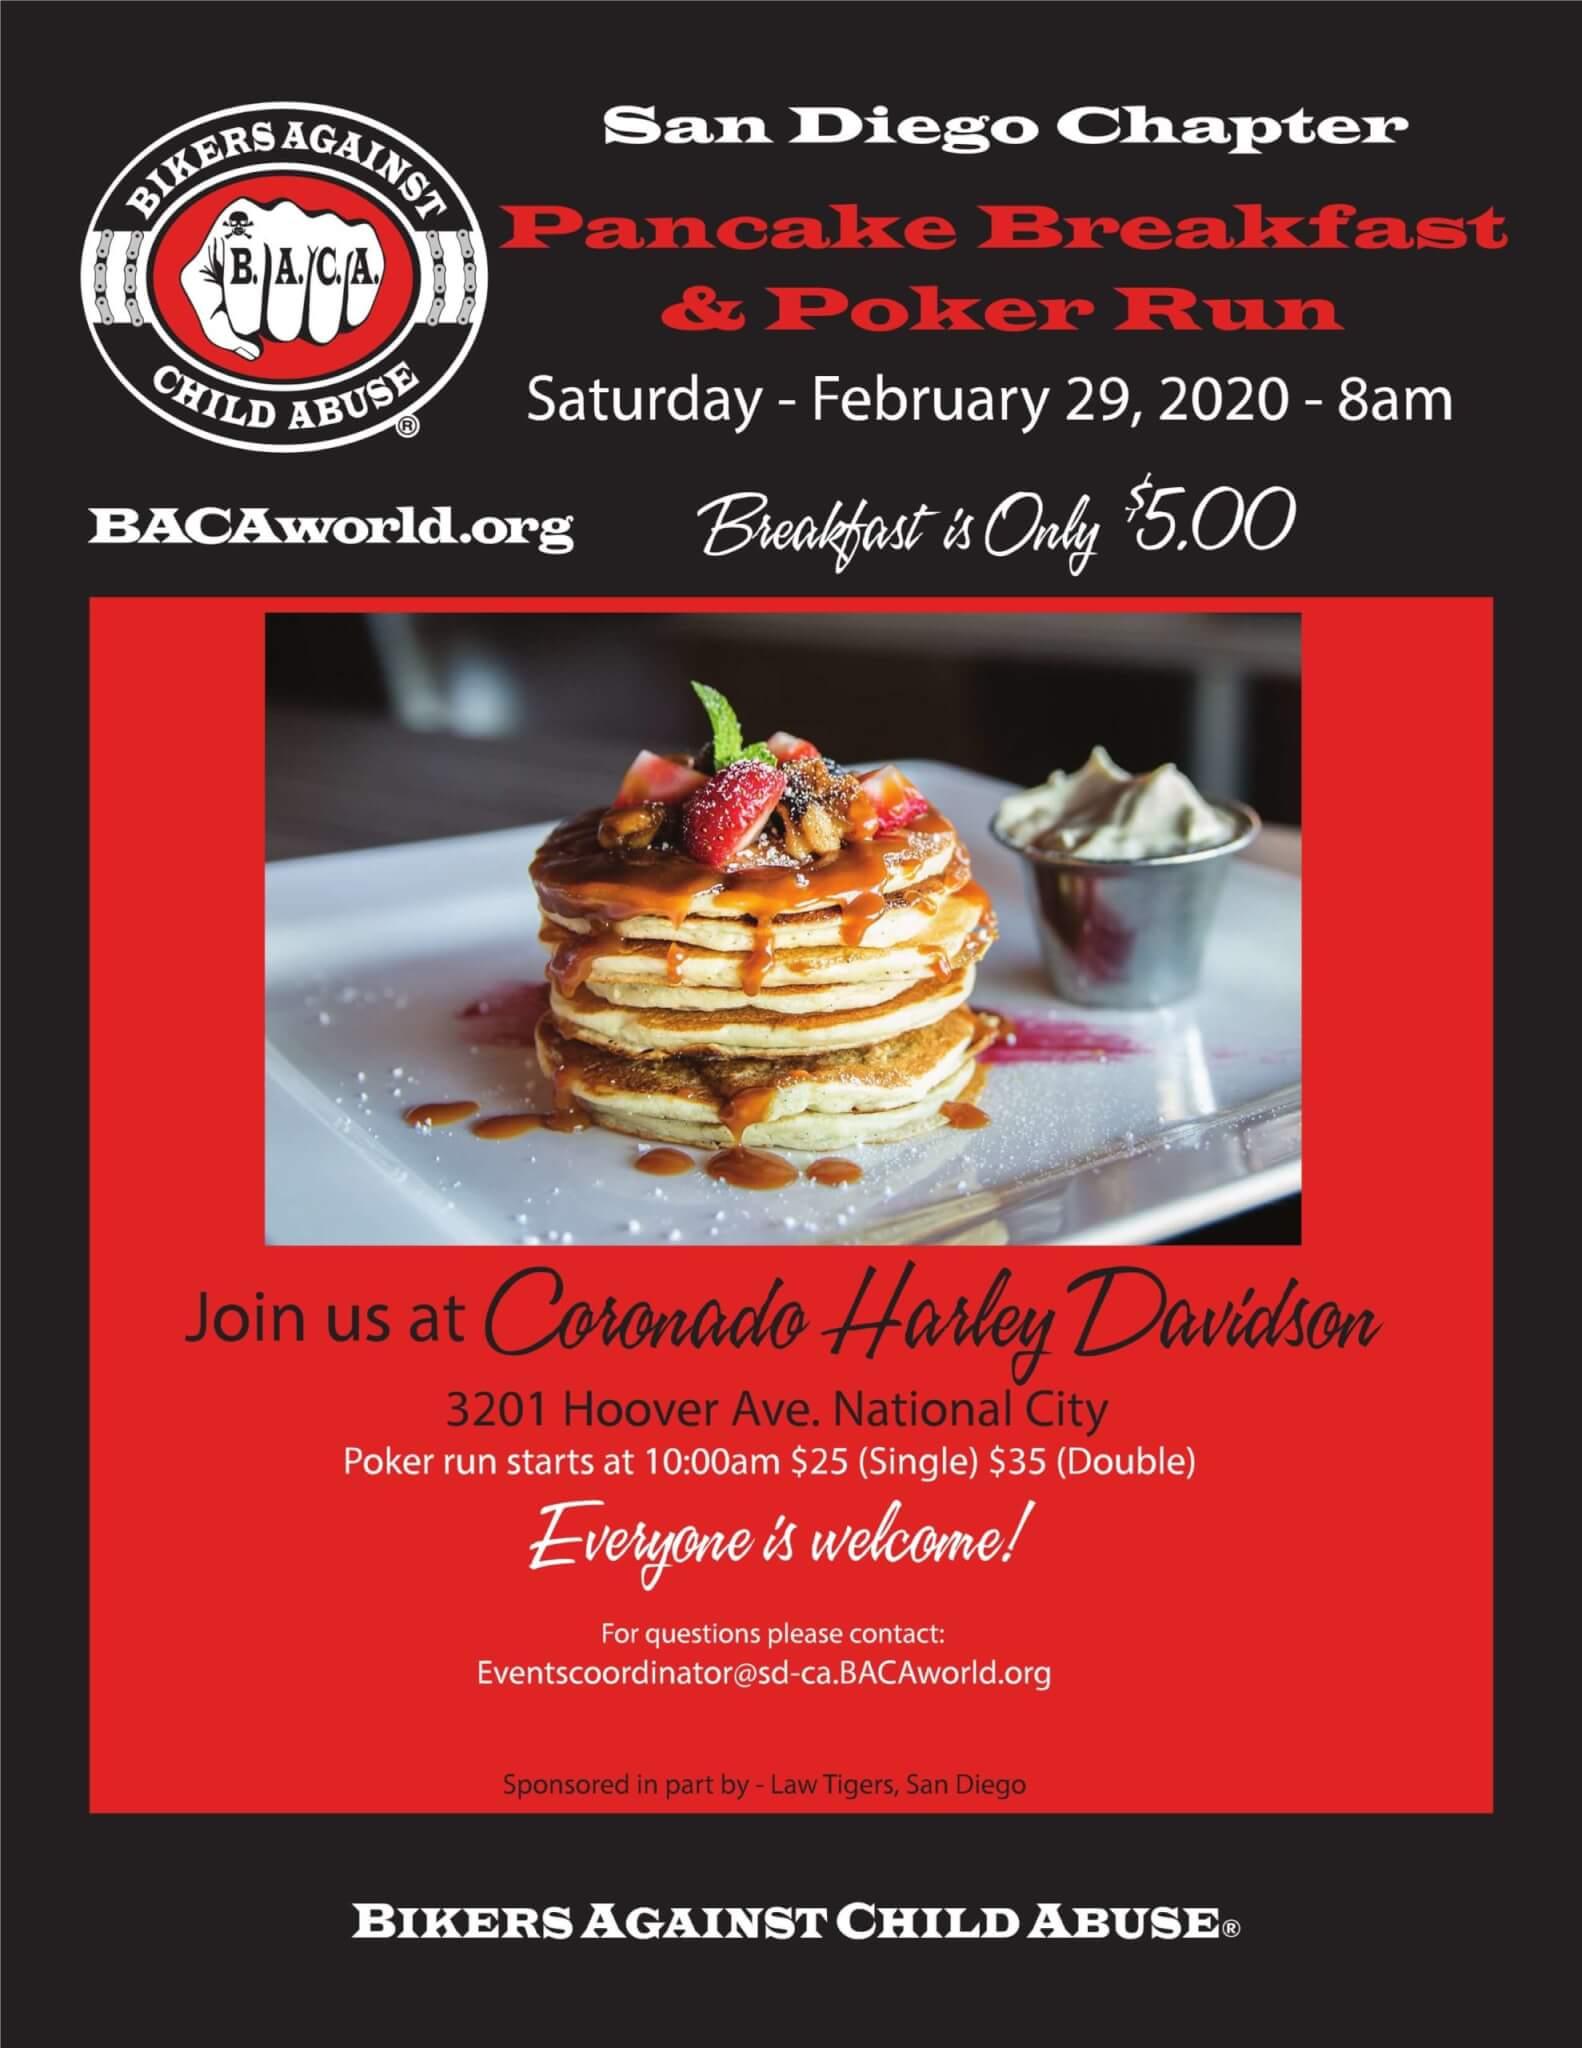 BACA San Diego Chapter Pancake Breakfast & Poker Run